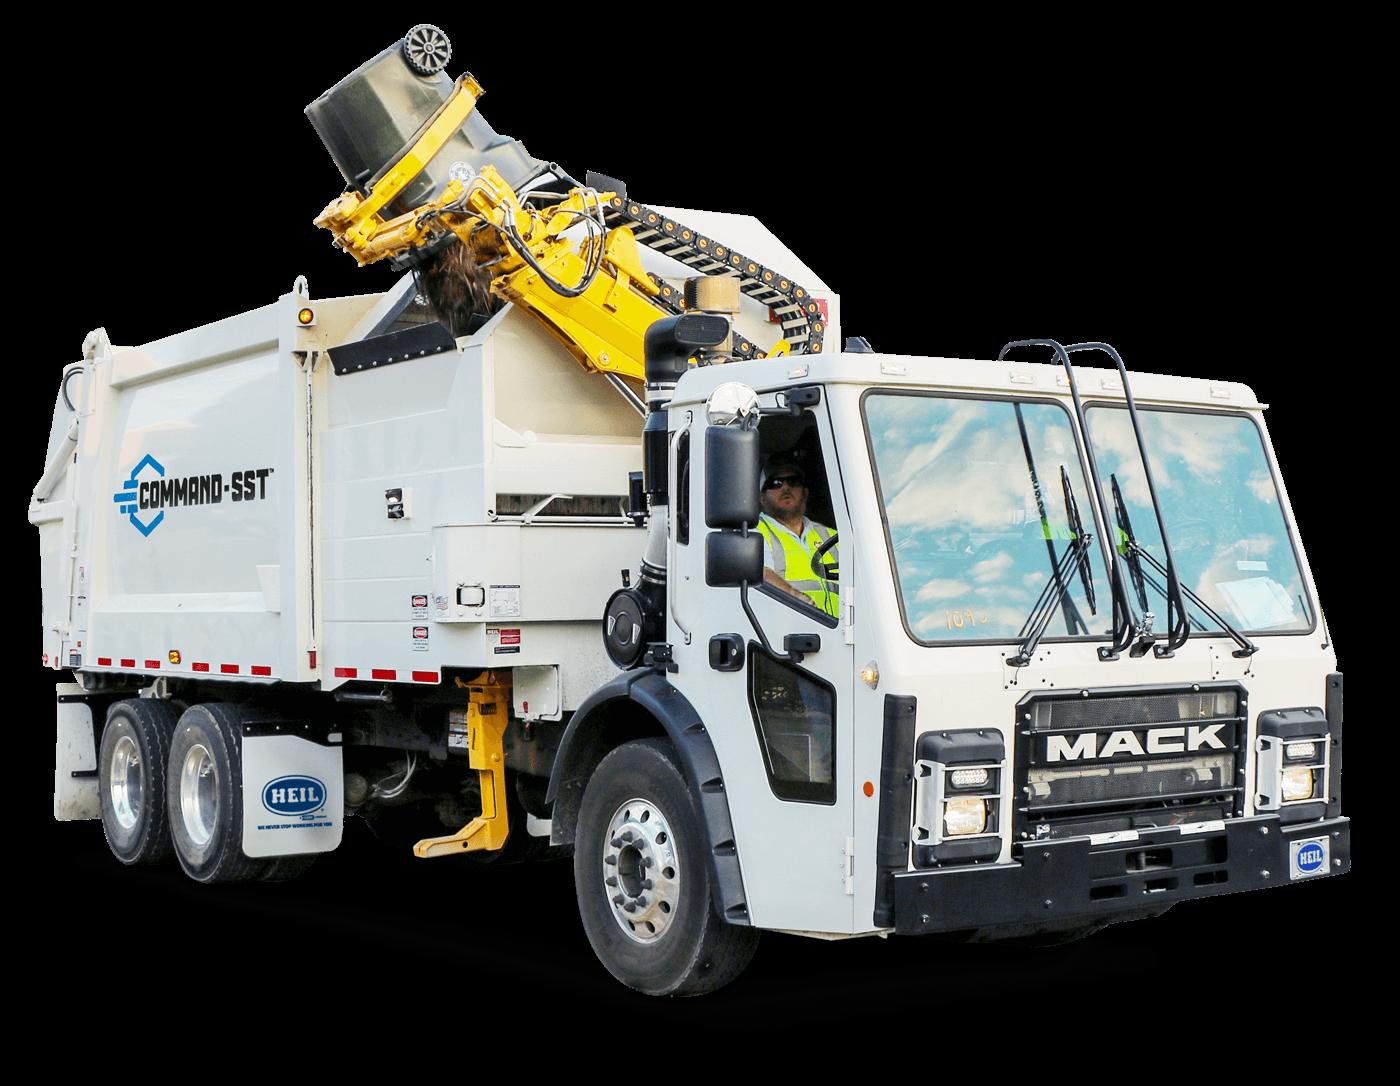 Command-SST Sideload Trash Trucks